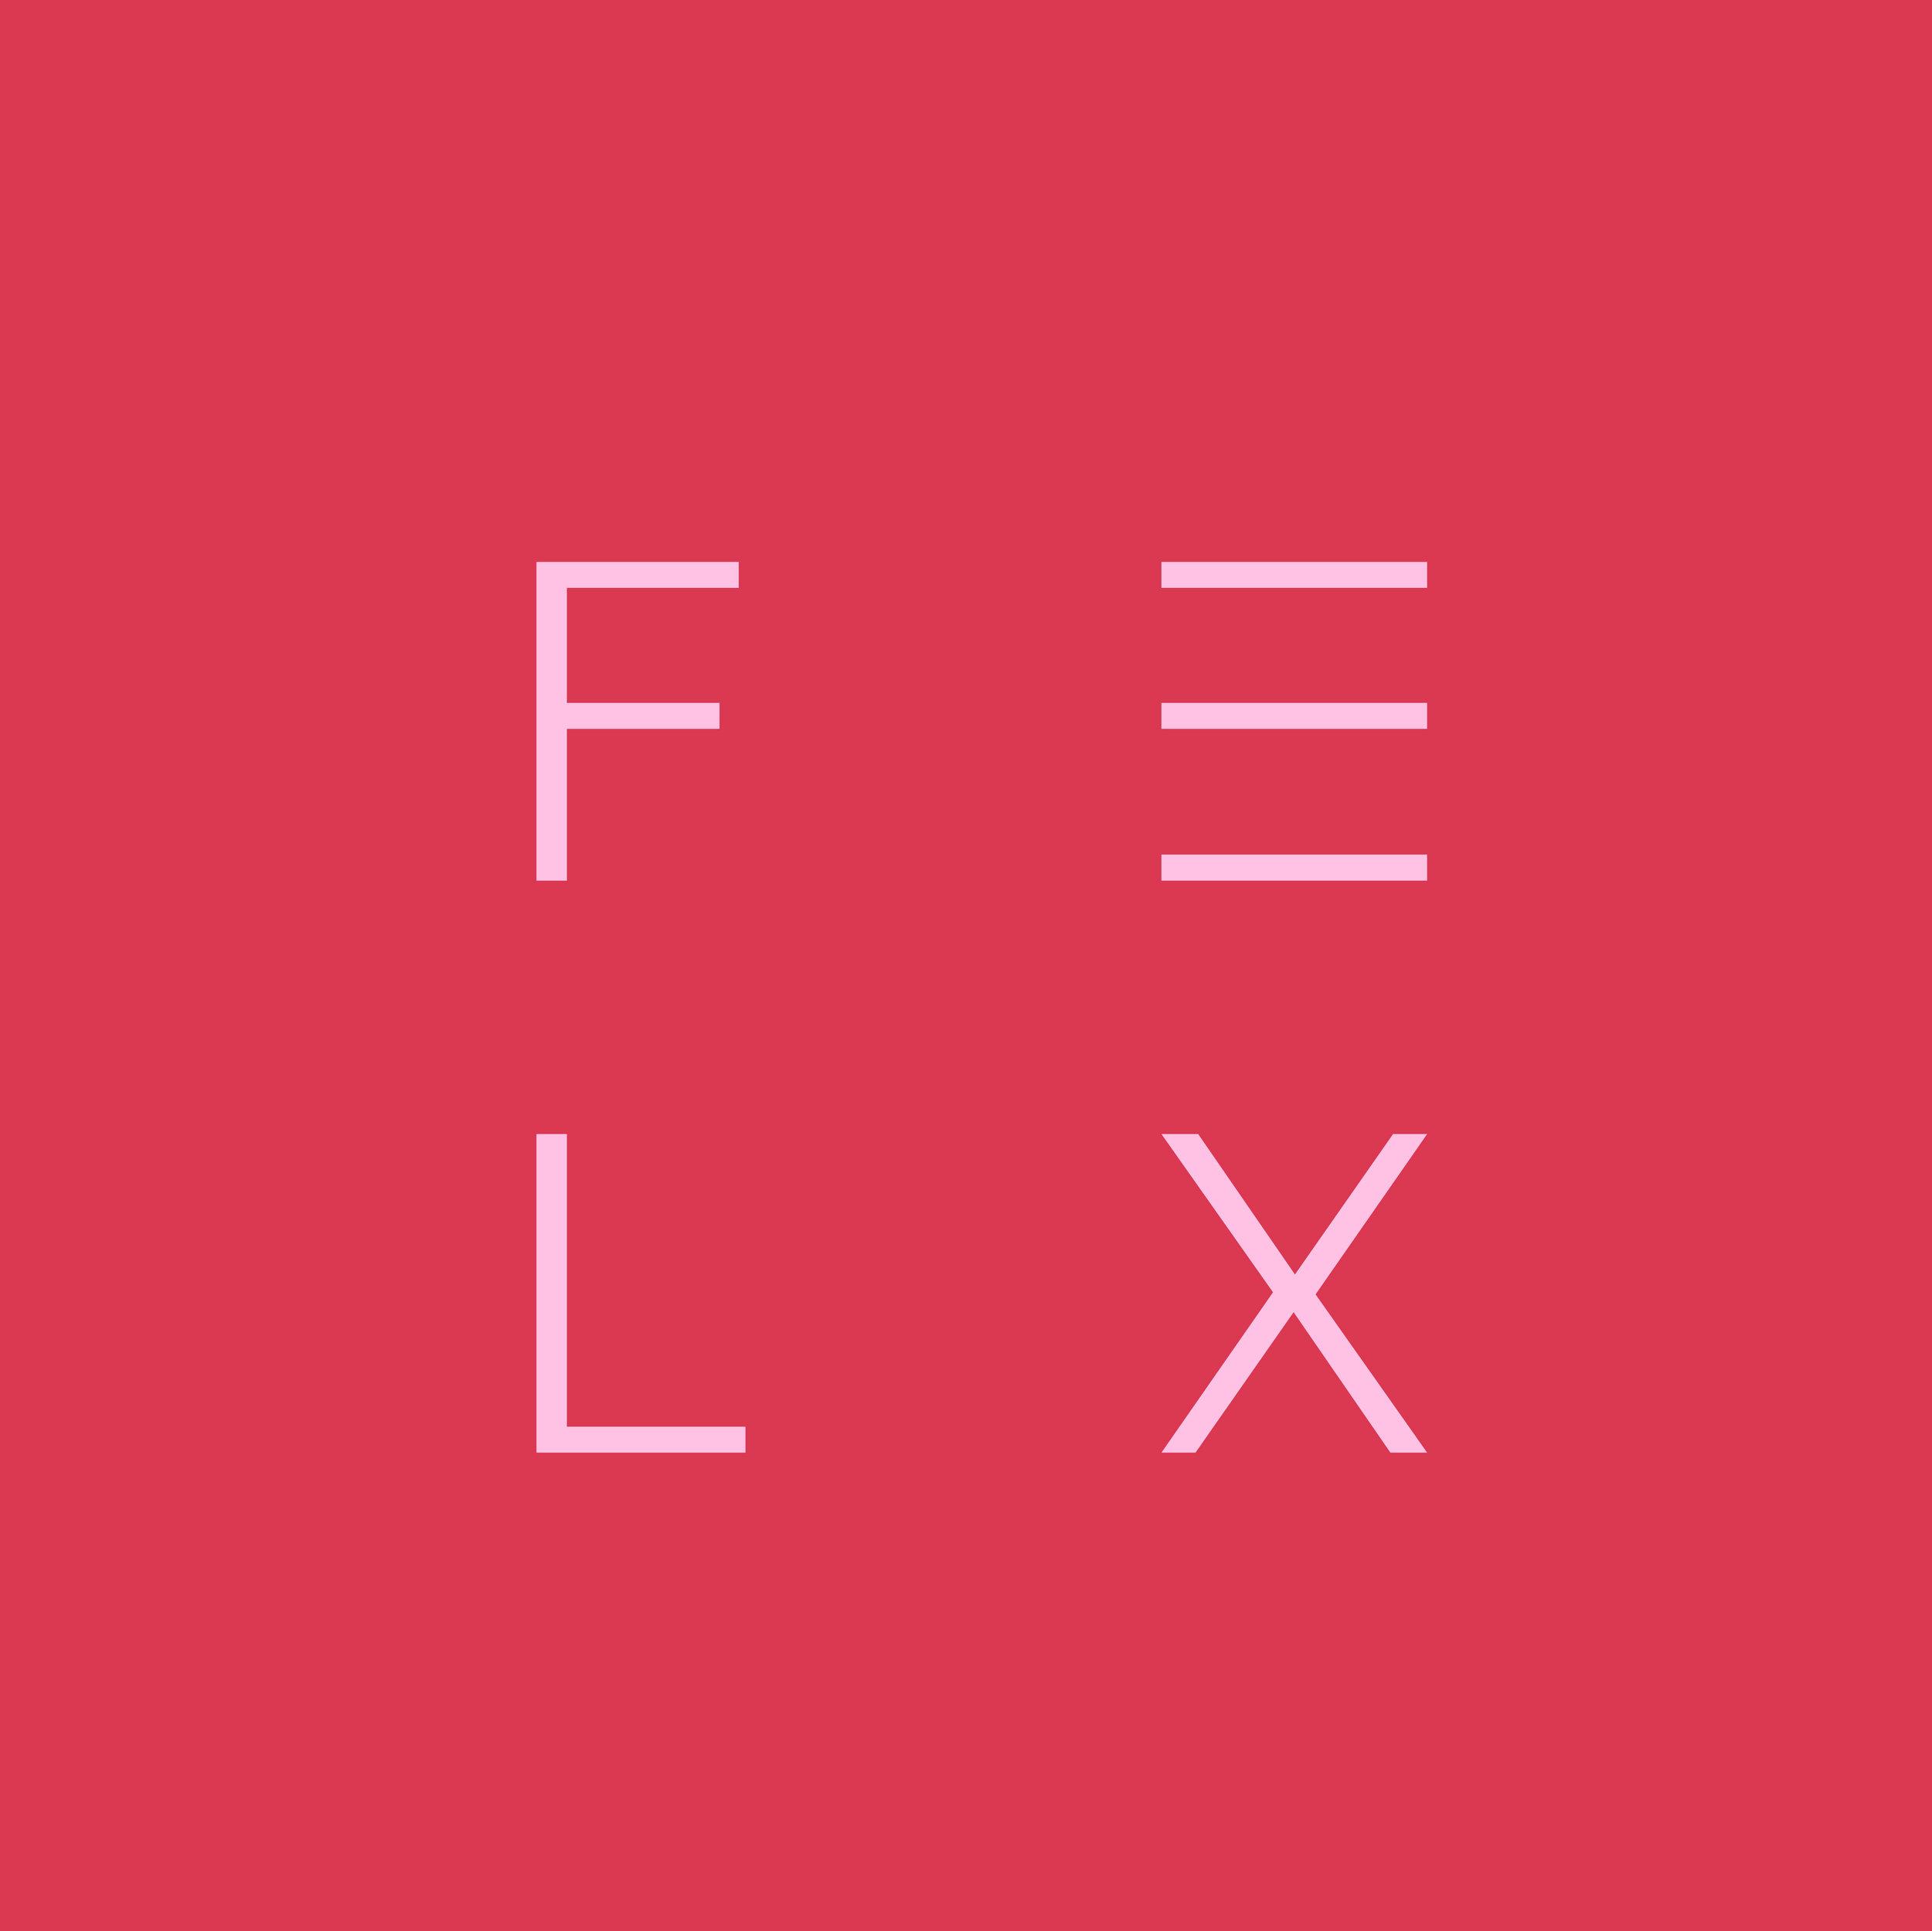 Flex_Instagram_Content-02.jpg